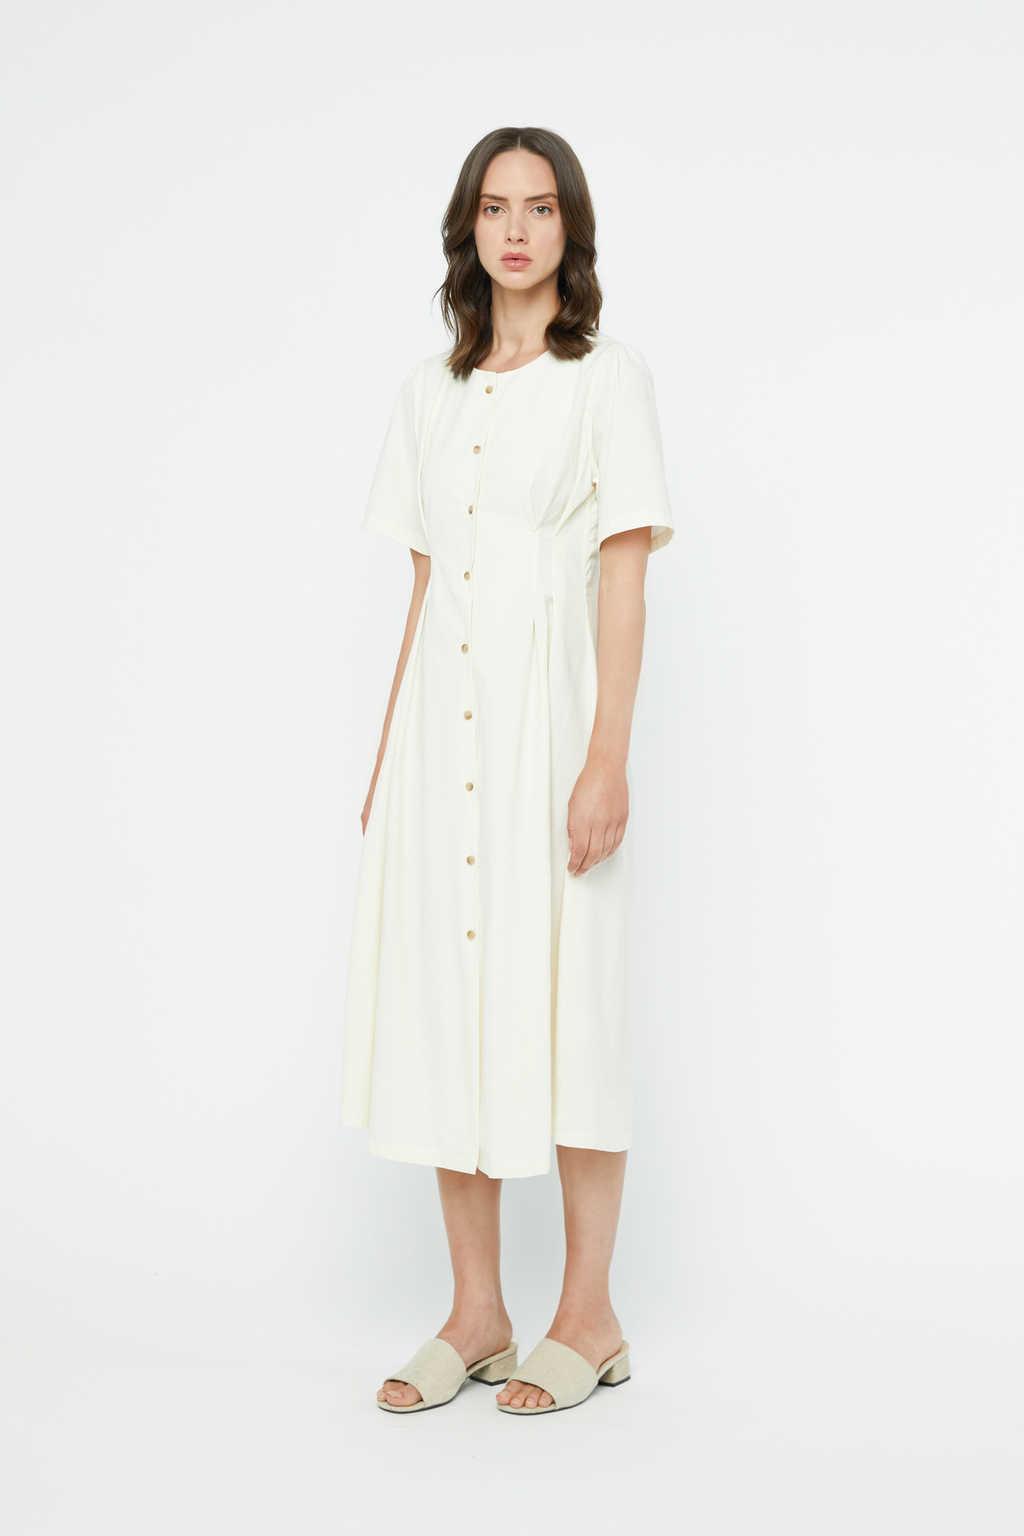 Dress K011 Cream 1